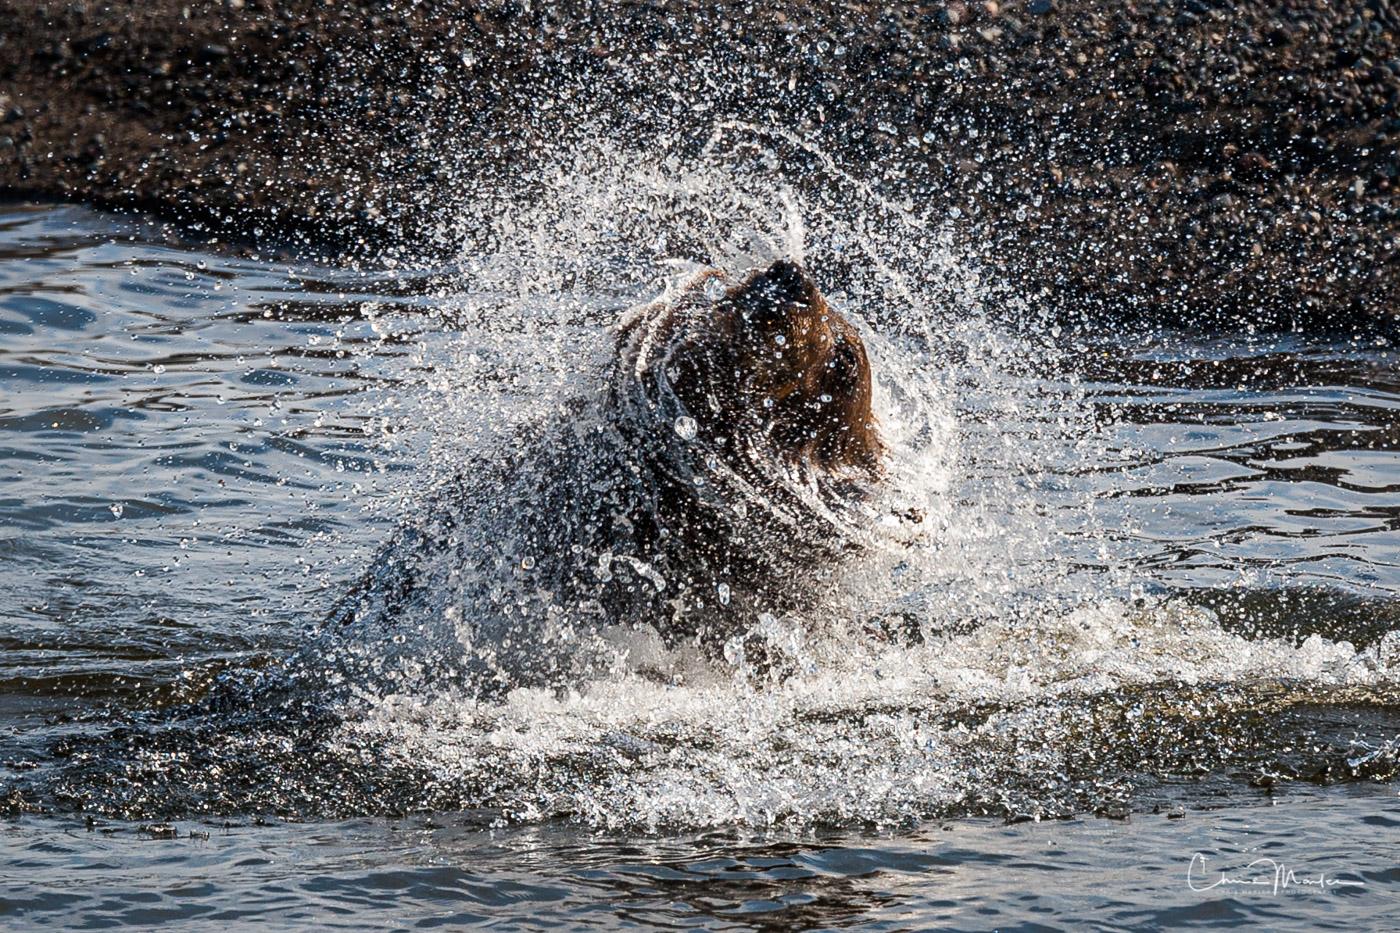 Grizzly, bear, shake, water, Lake Clark National Park, Alaska, wildlife, photo